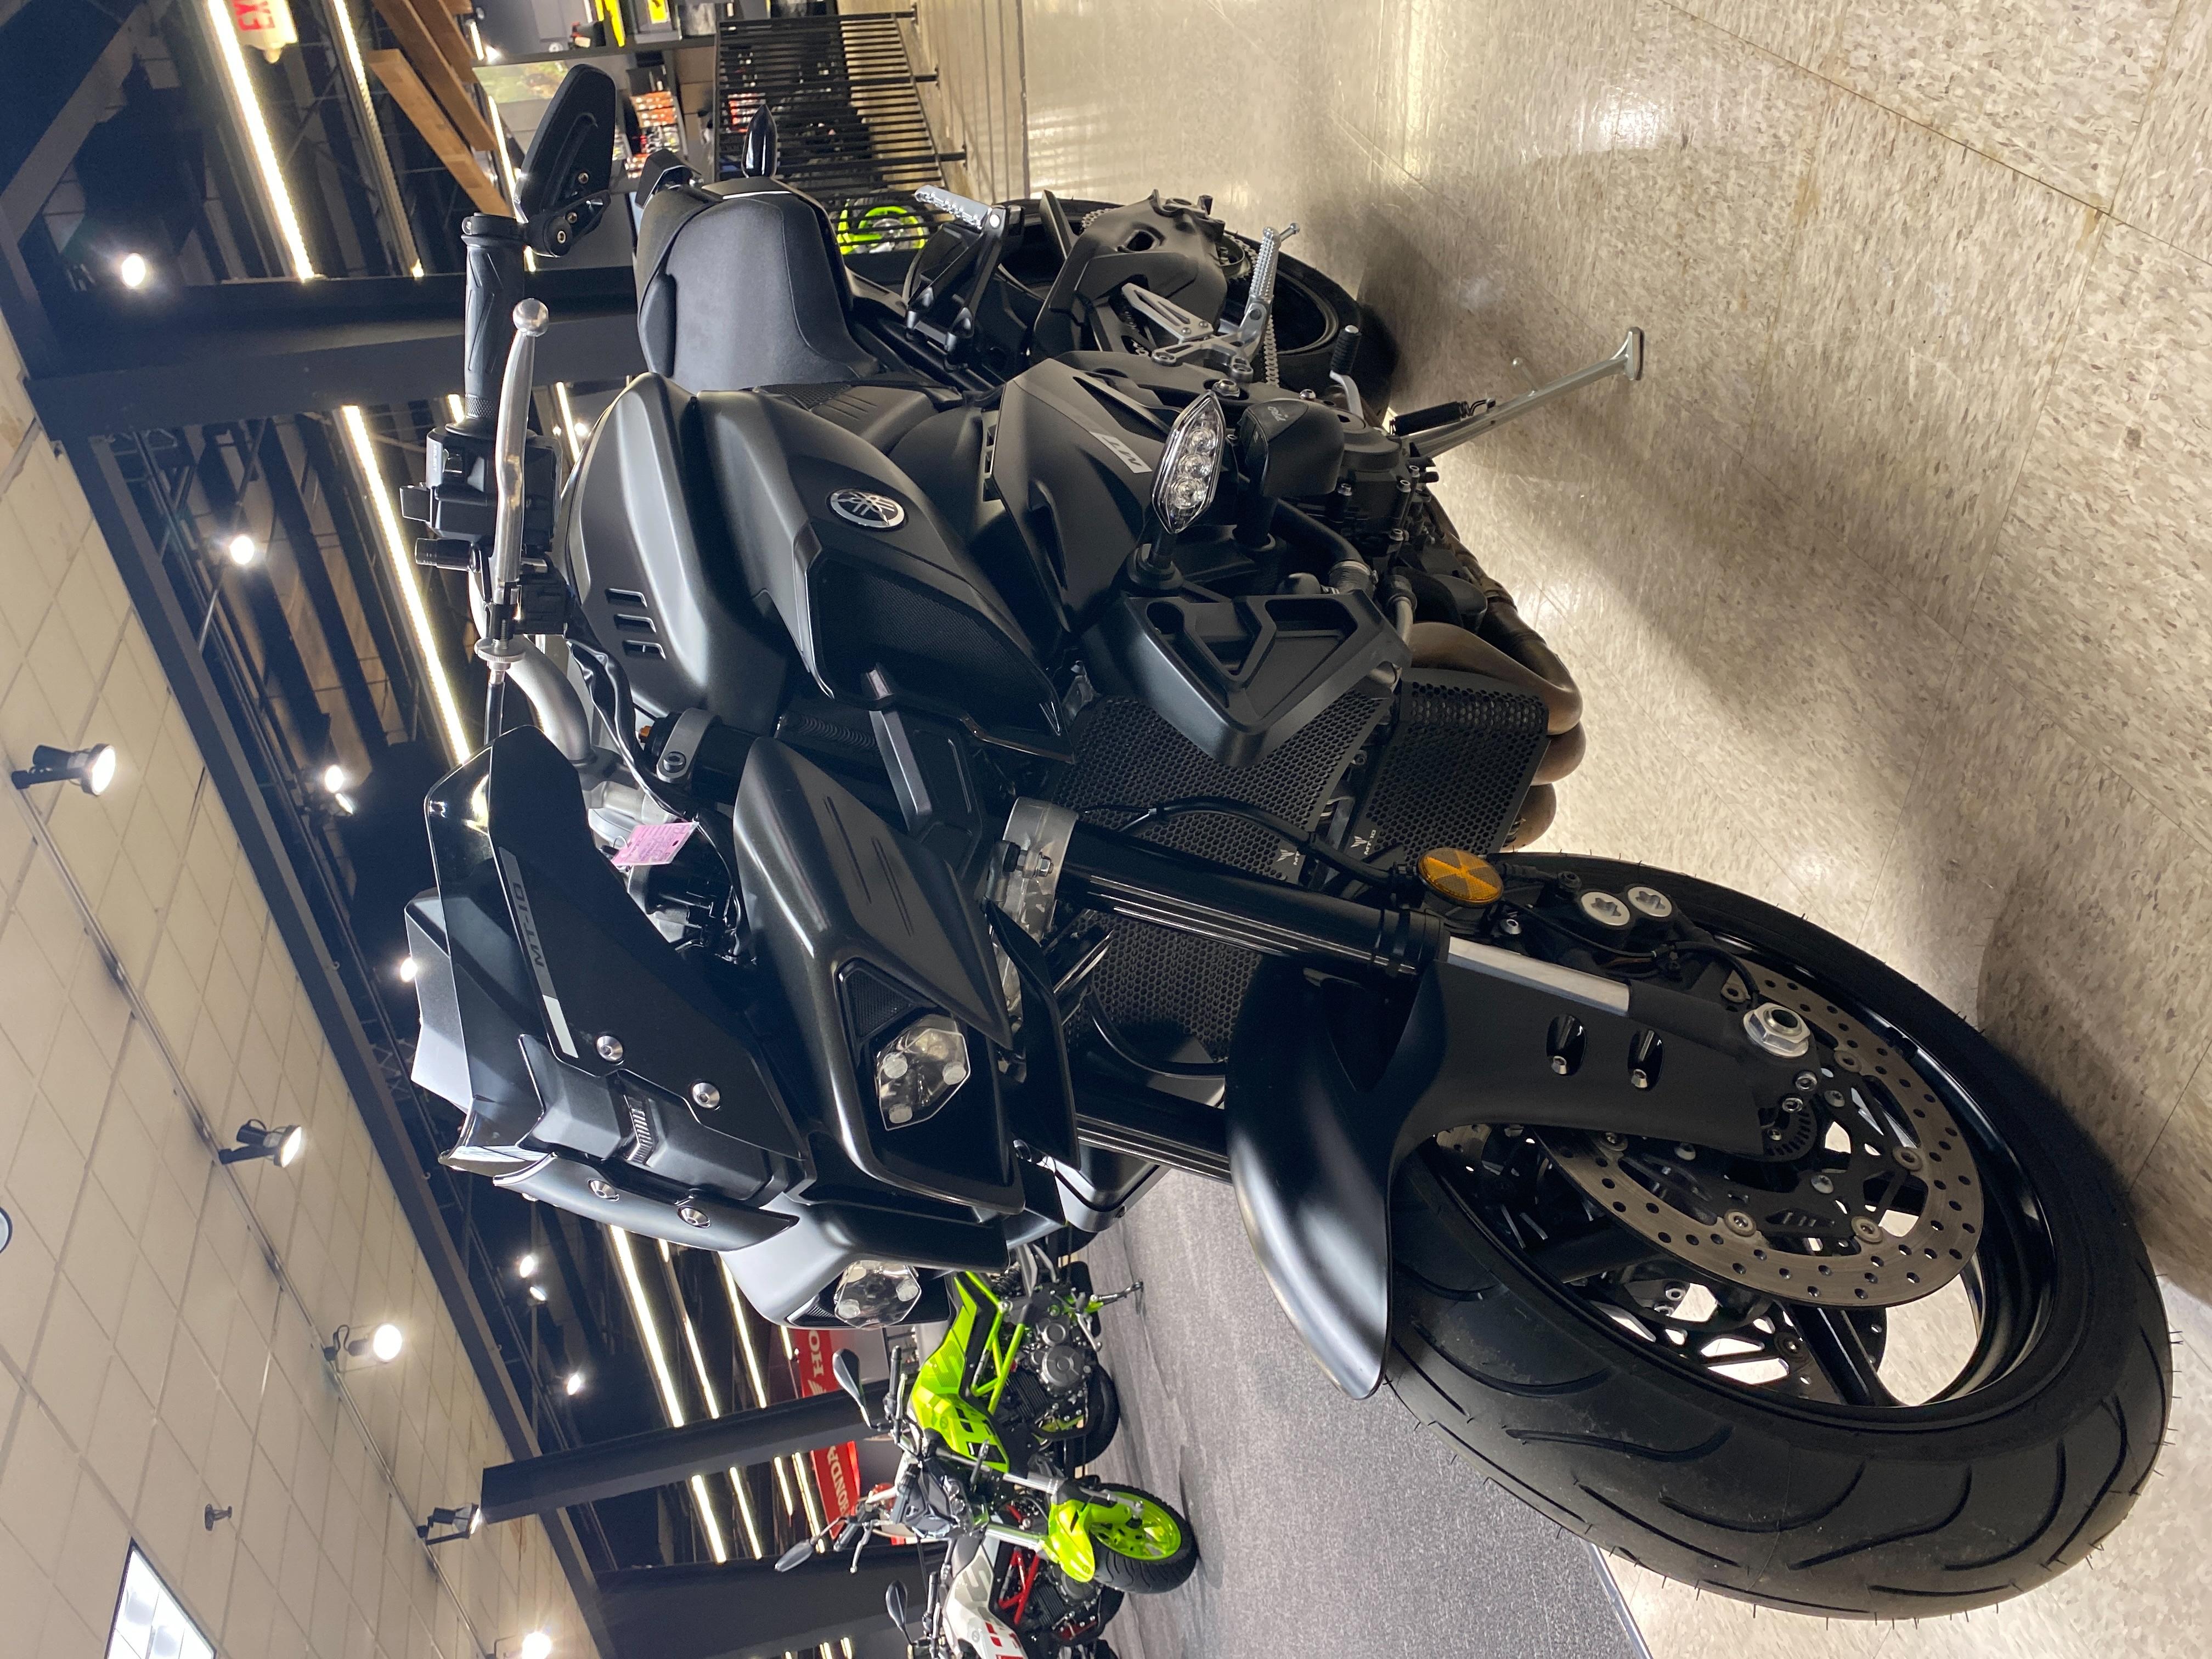 2020 Yamaha MT-10 10 at Sloans Motorcycle ATV, Murfreesboro, TN, 37129